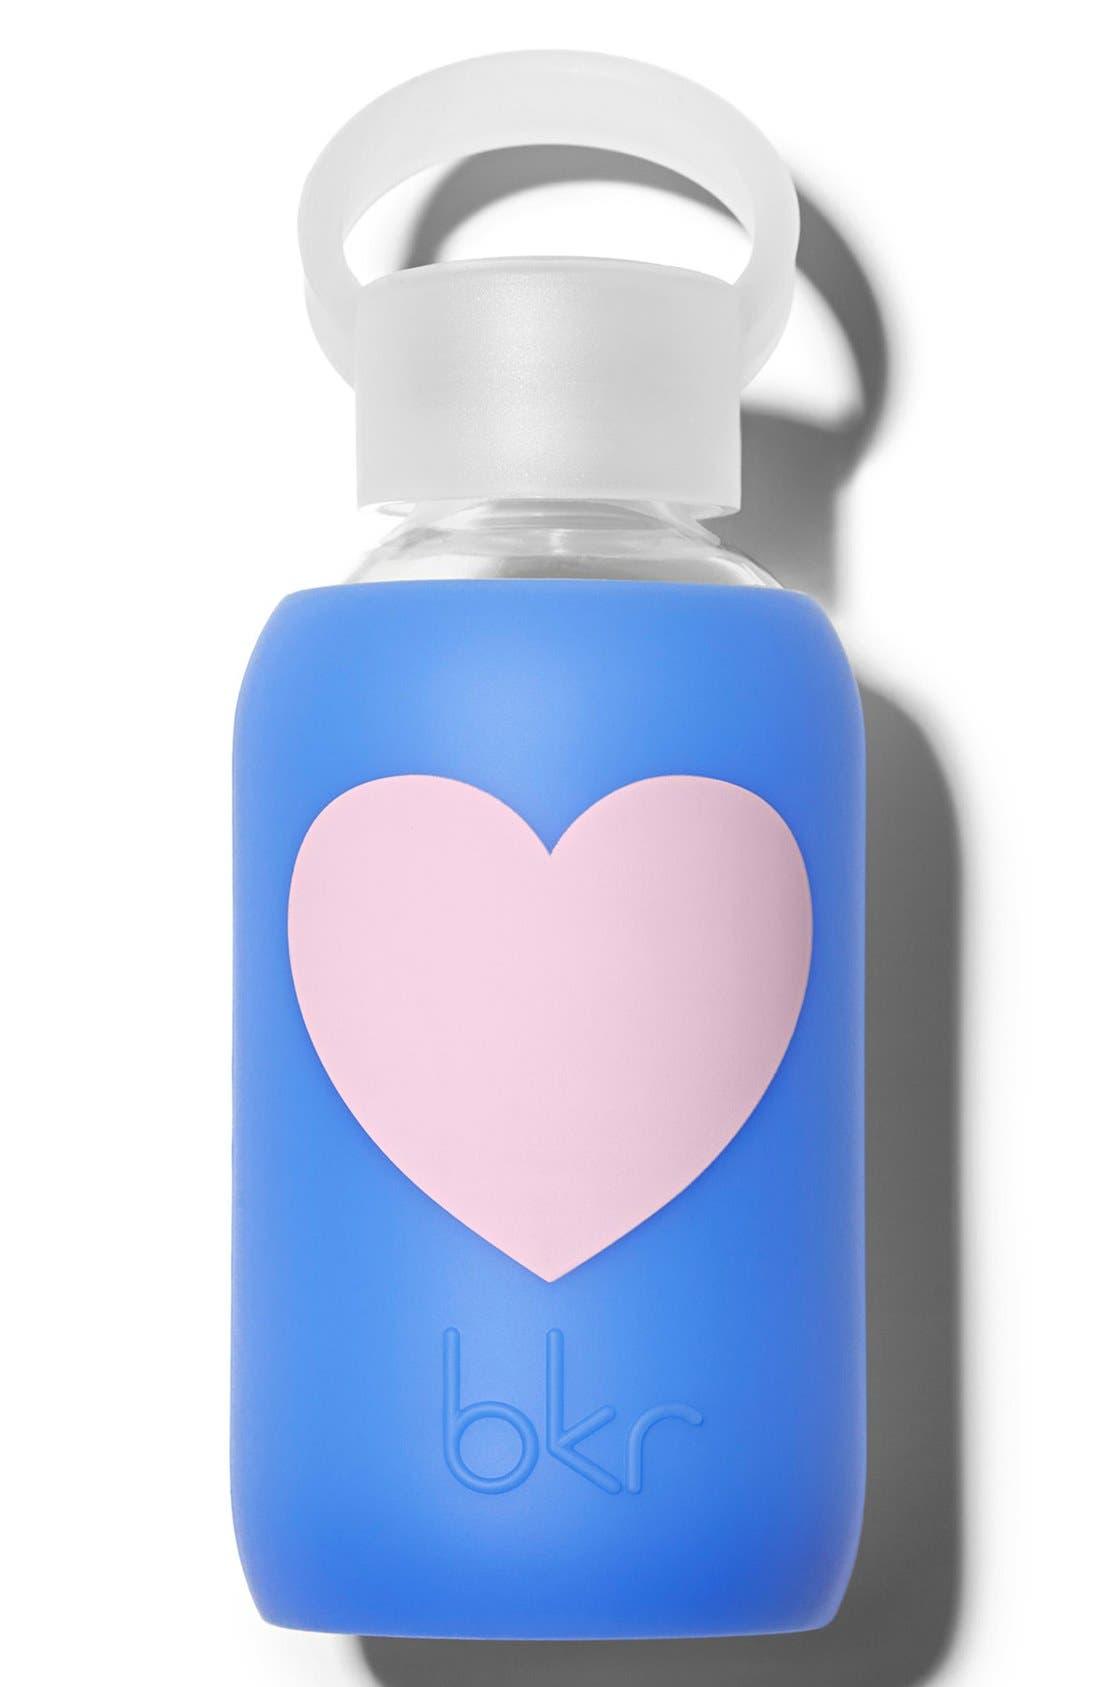 BKR  Heart 8-Ounce Glass Water Bottle, Main, color, 400